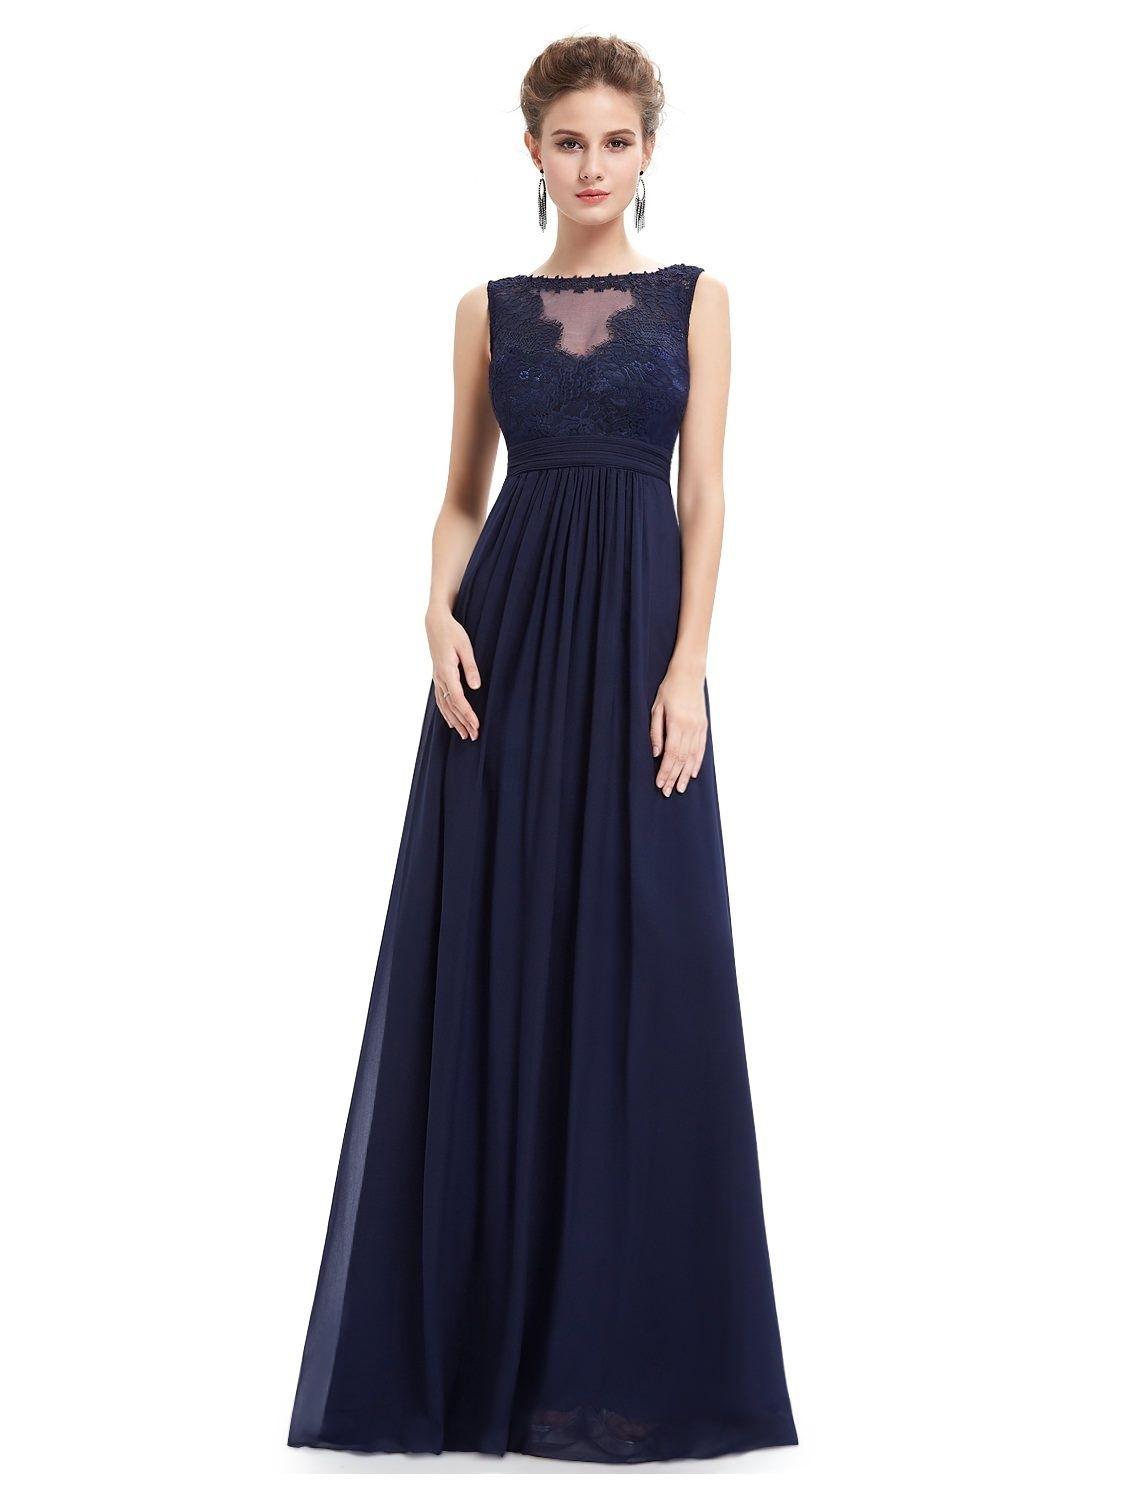 17 Genial Langes Kleid Spitze Bester Preis13 Coolste Langes Kleid Spitze Stylish